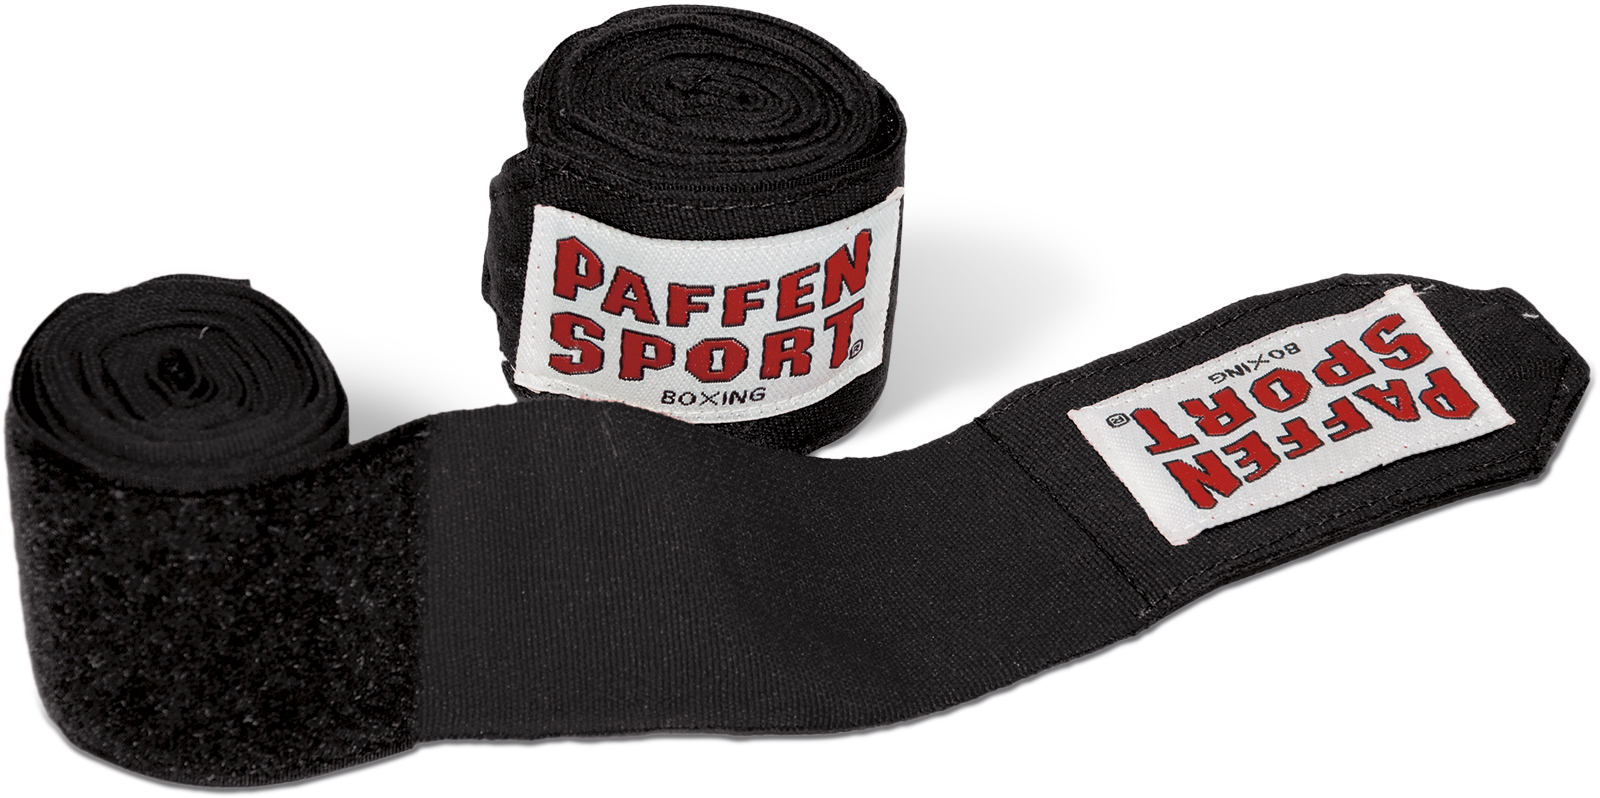 Боксерские бинты Paffen Sport ALLROUND Boxing bandages 4.5 м